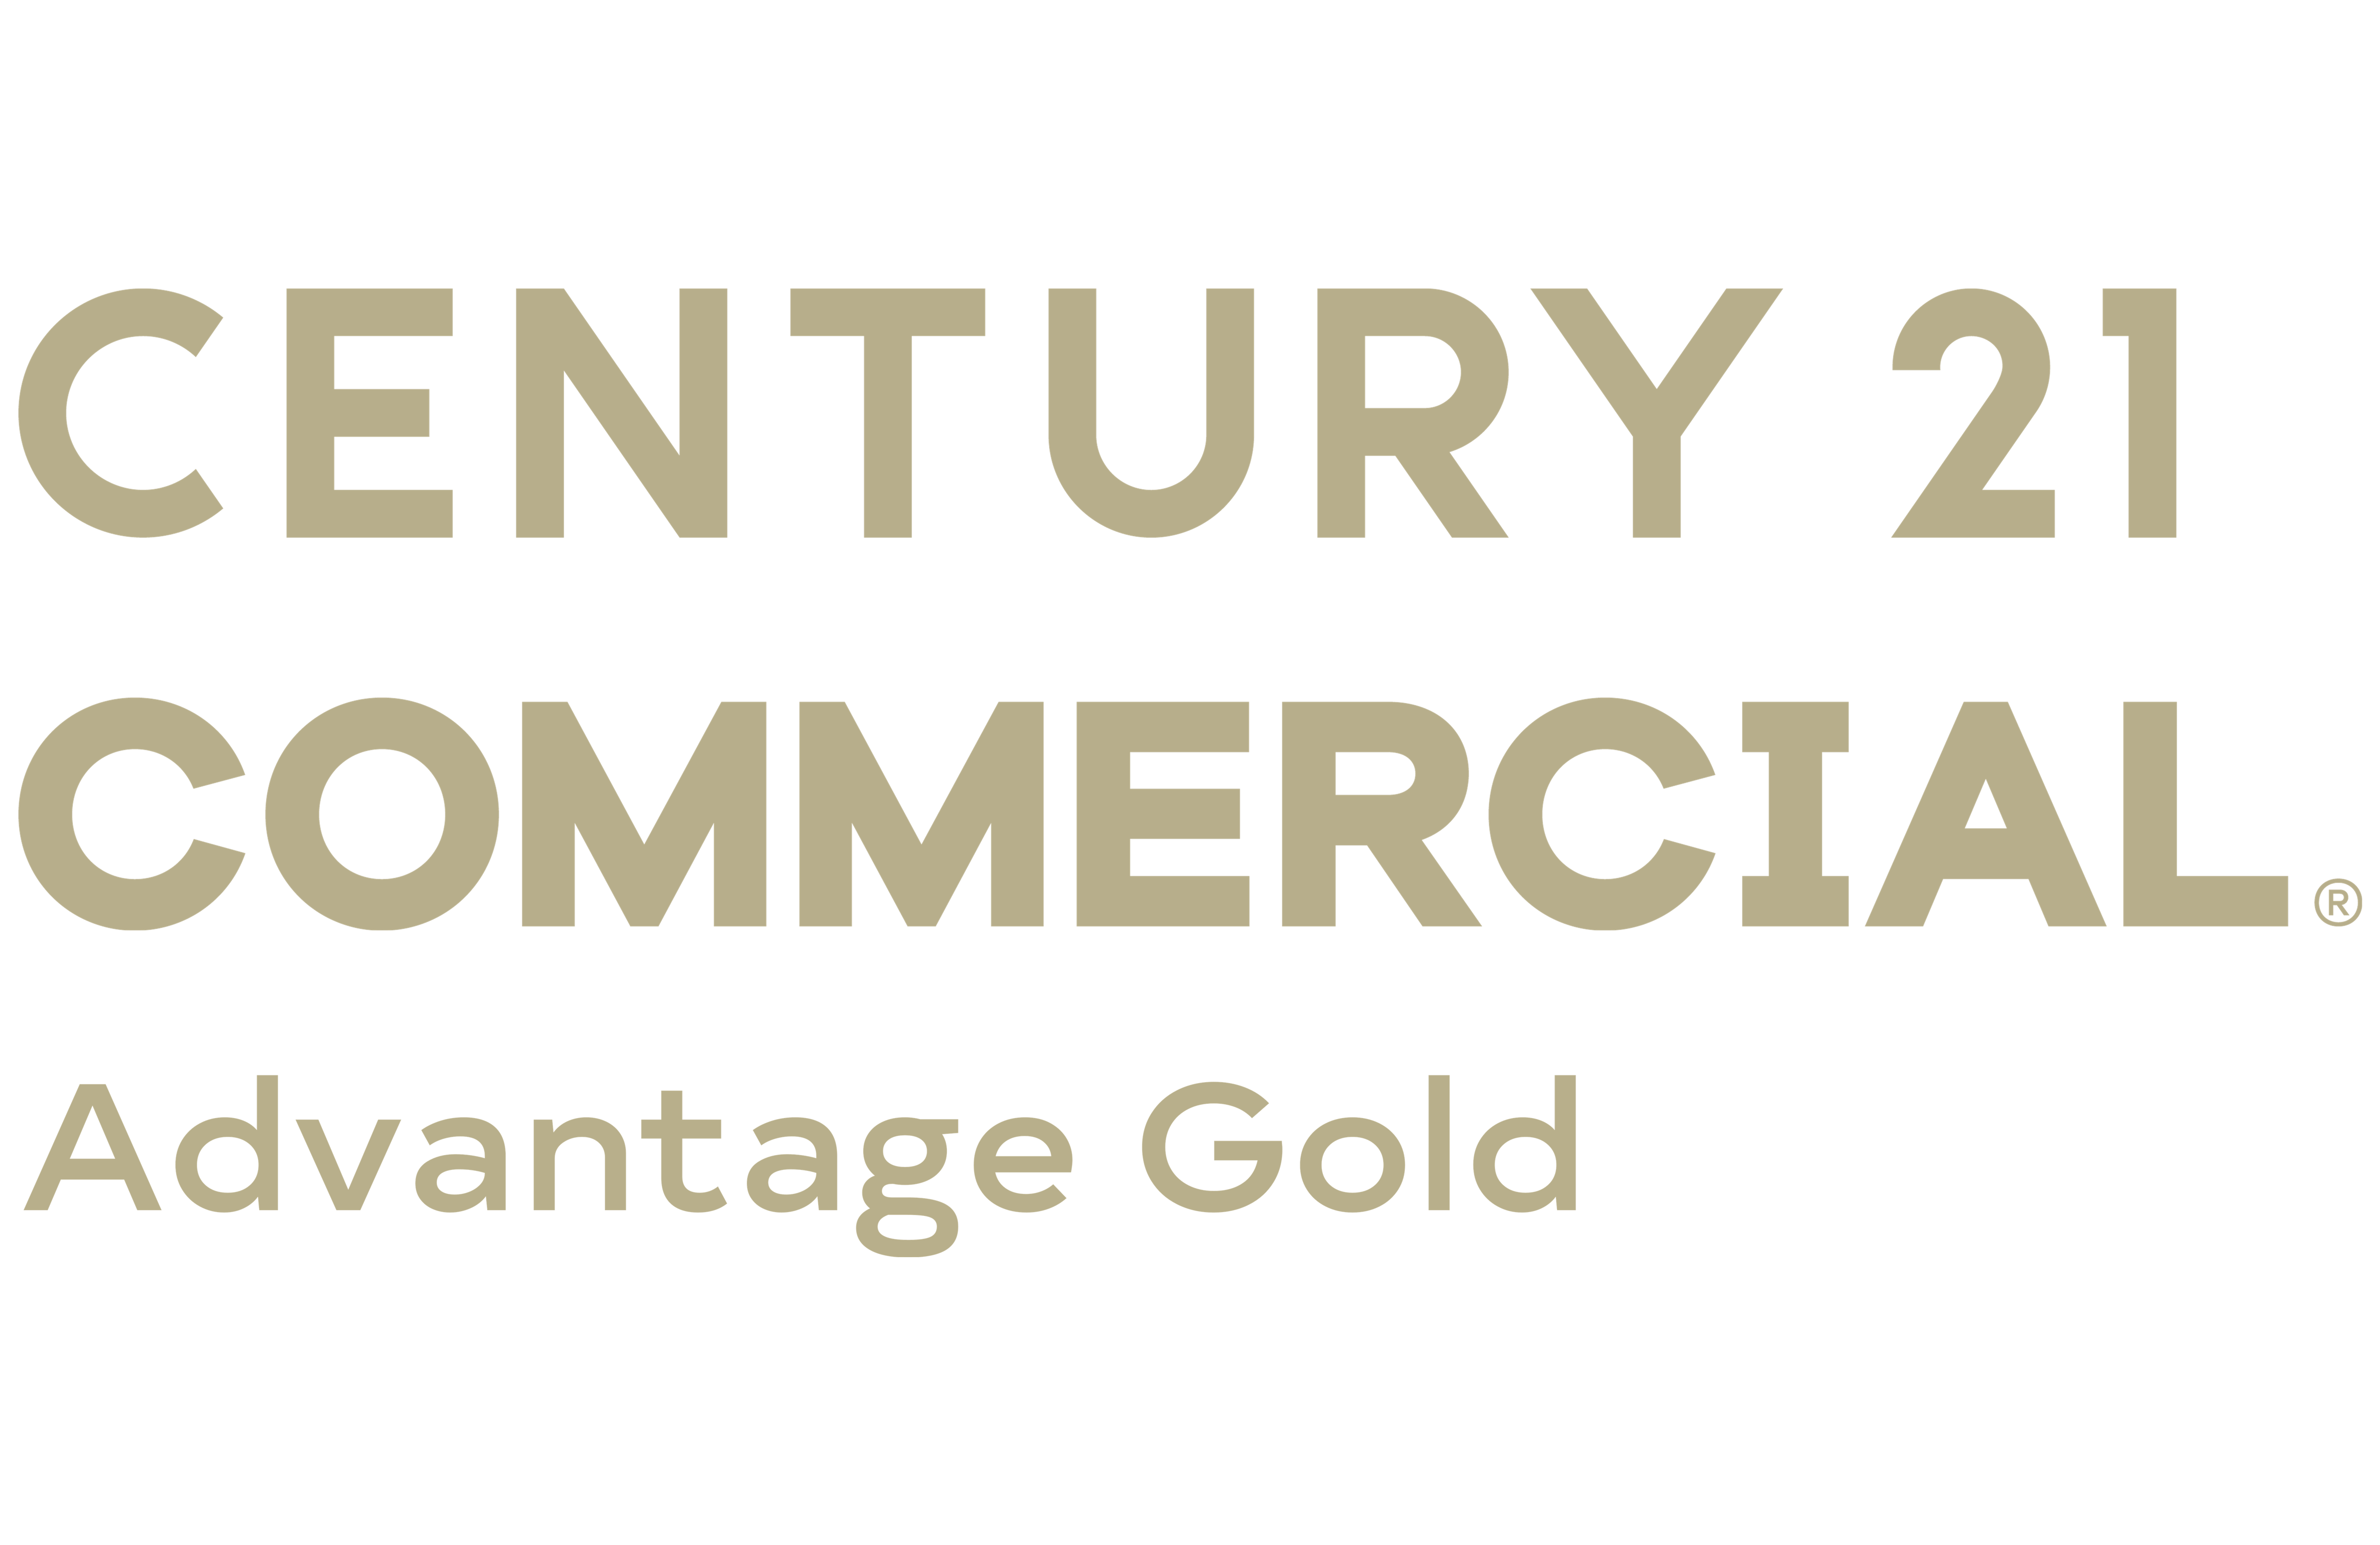 Kathaleen Aviles-Robles of CENTURY 21 Advantage Gold logo